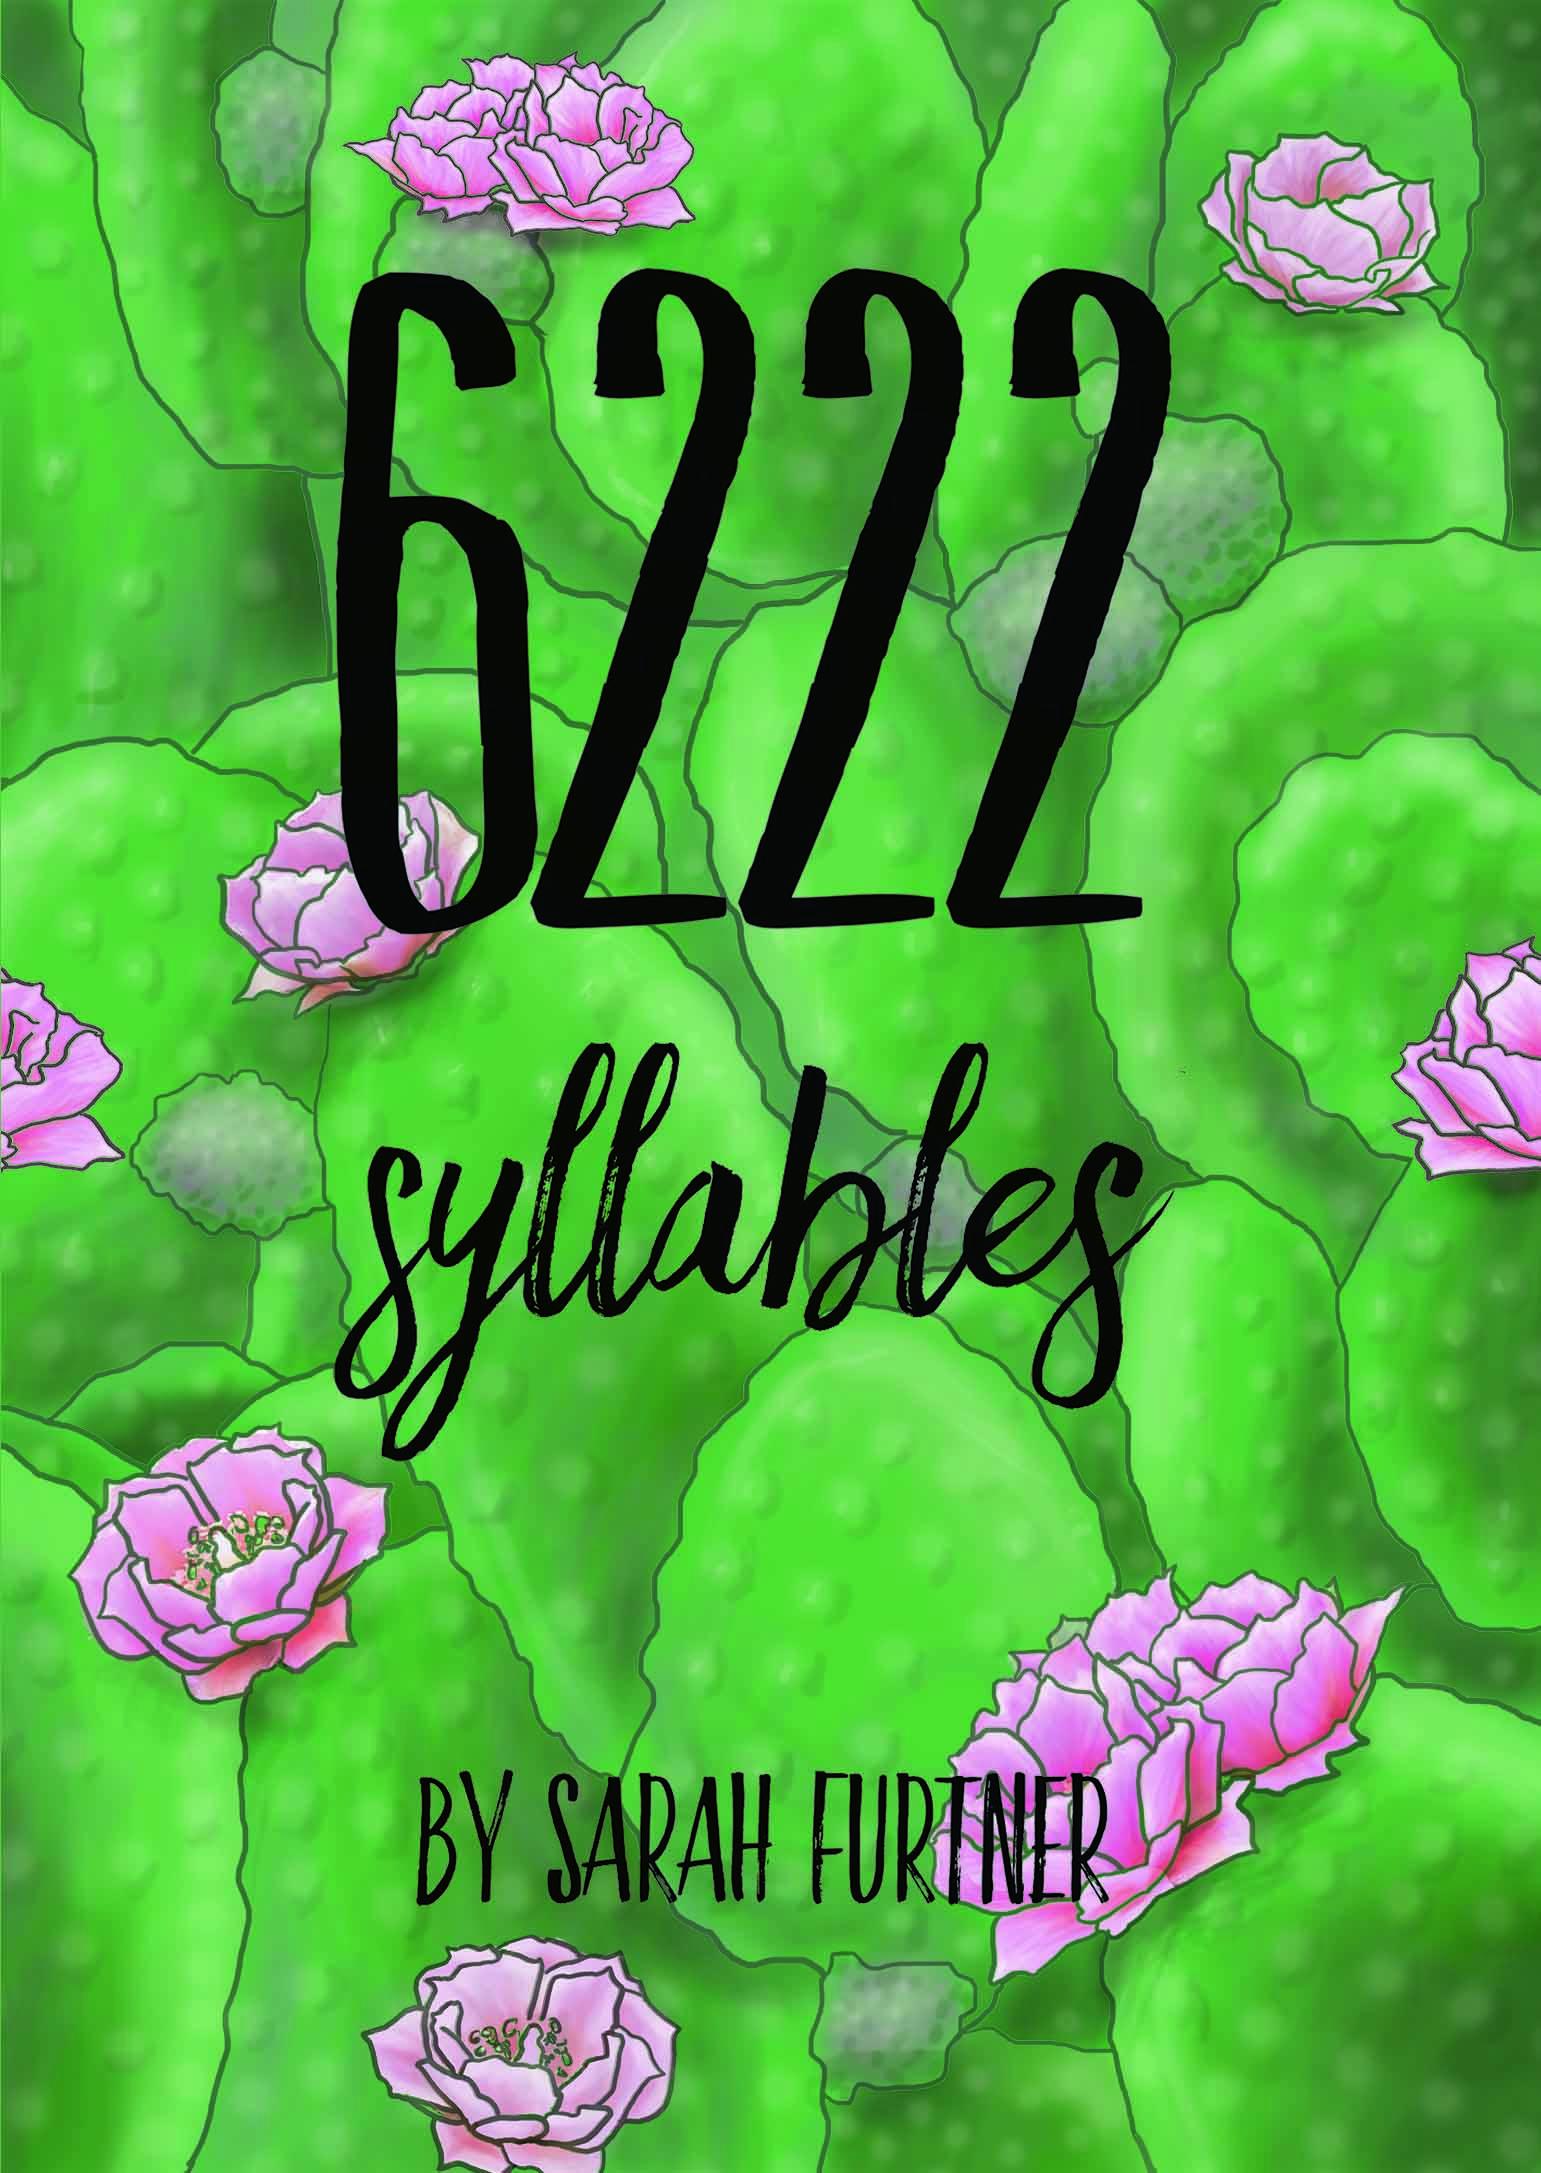 Sarah Furtner 6222 ebook cover